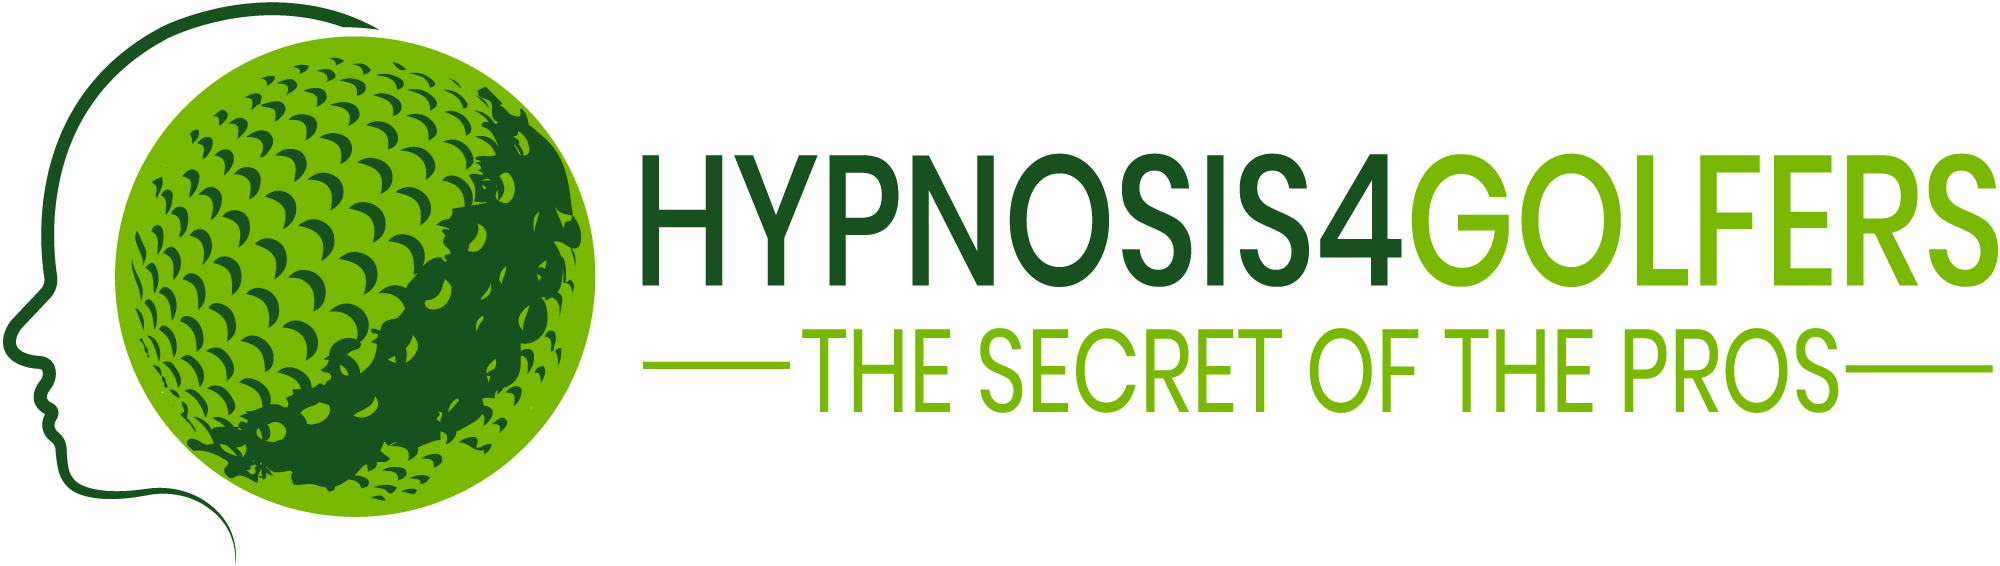 hypnosis4golfers logo